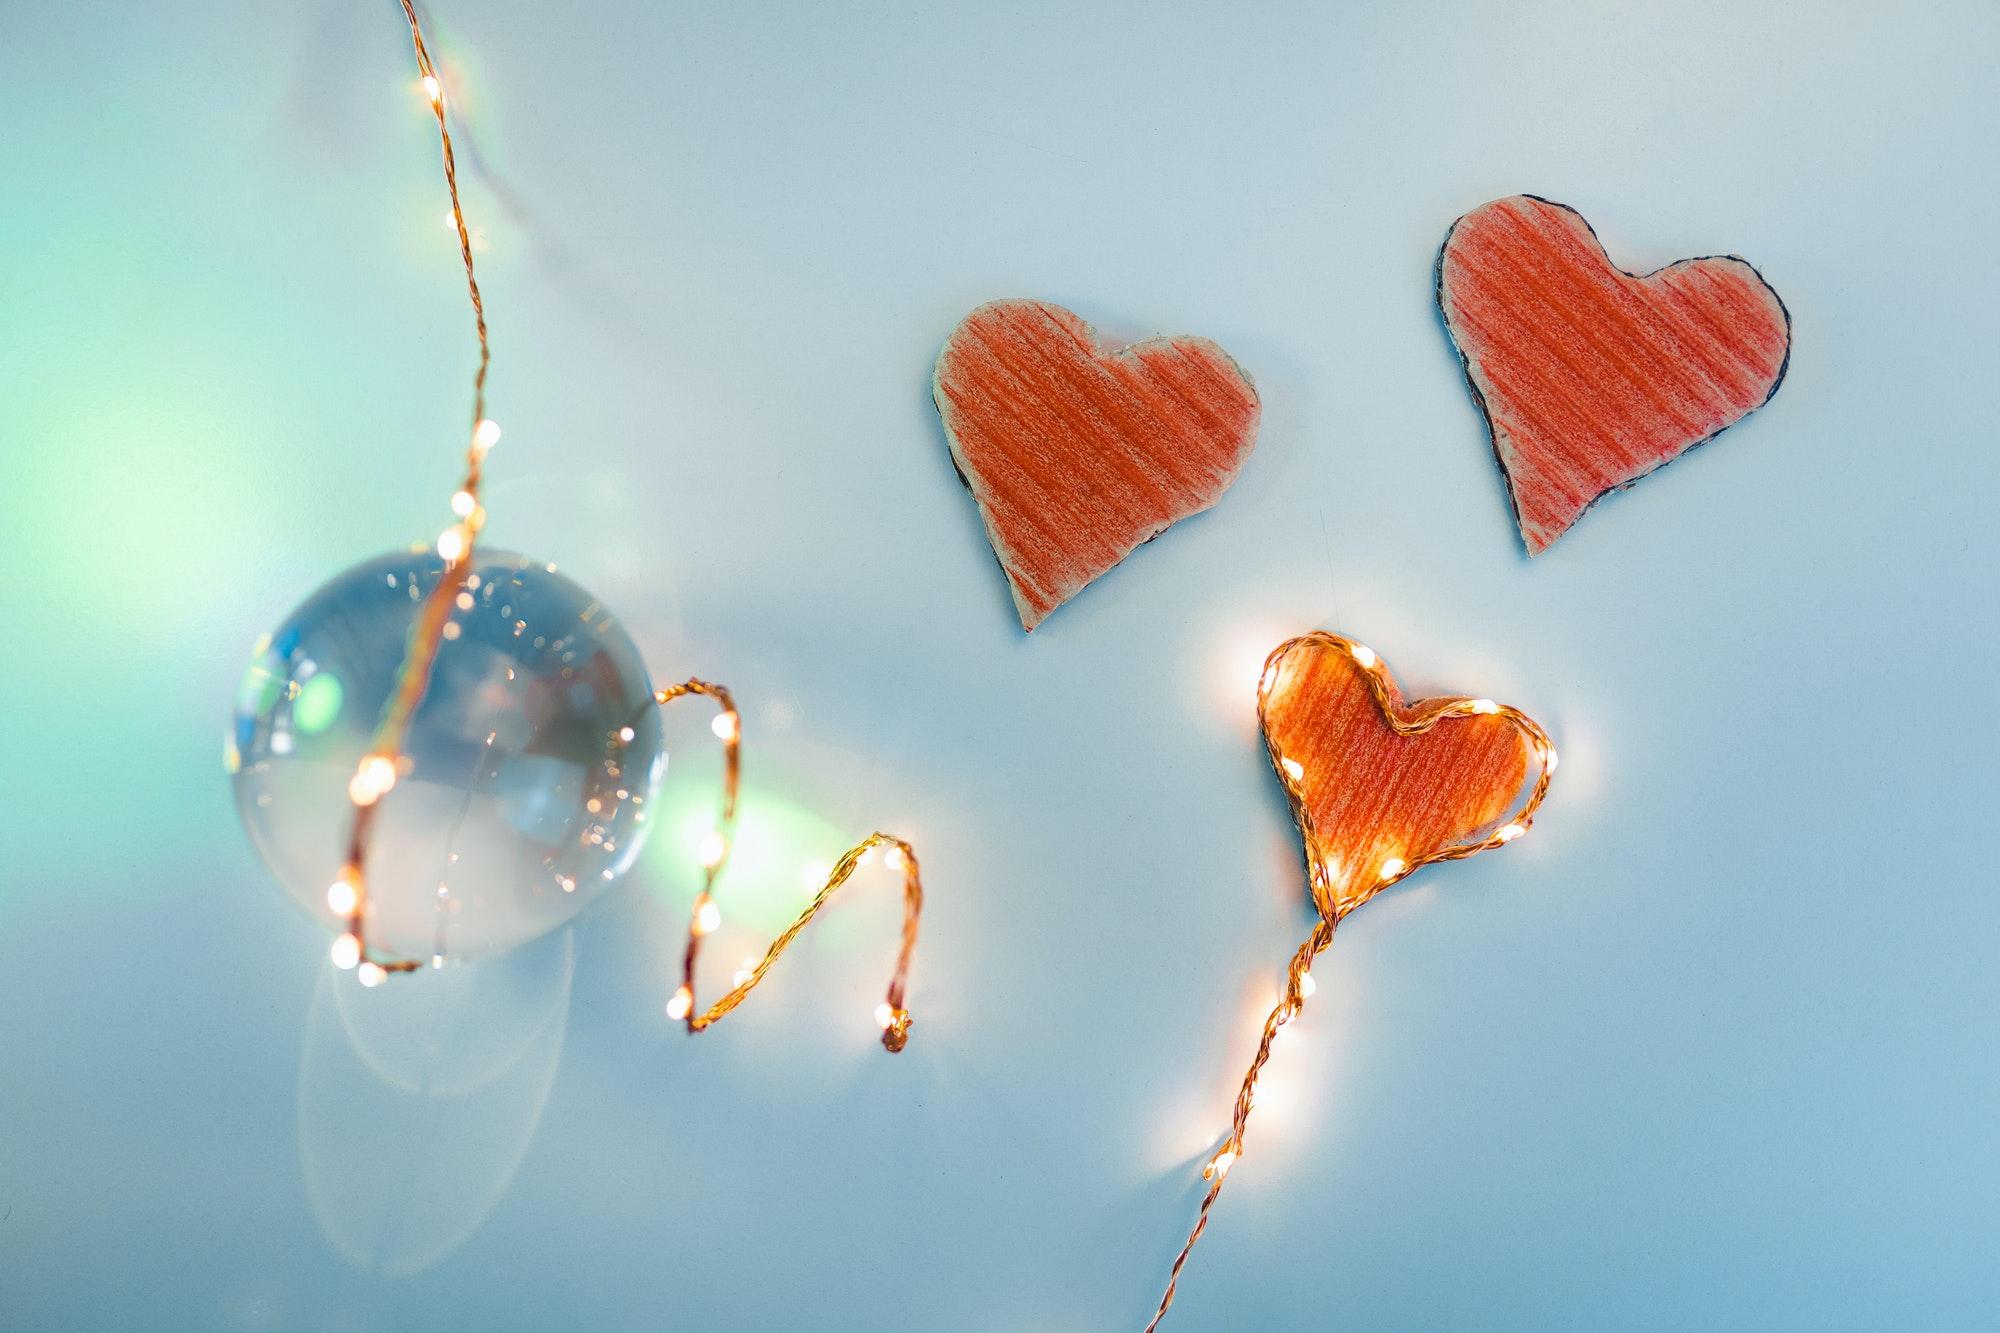 Valentine's Day Background in Covid Period